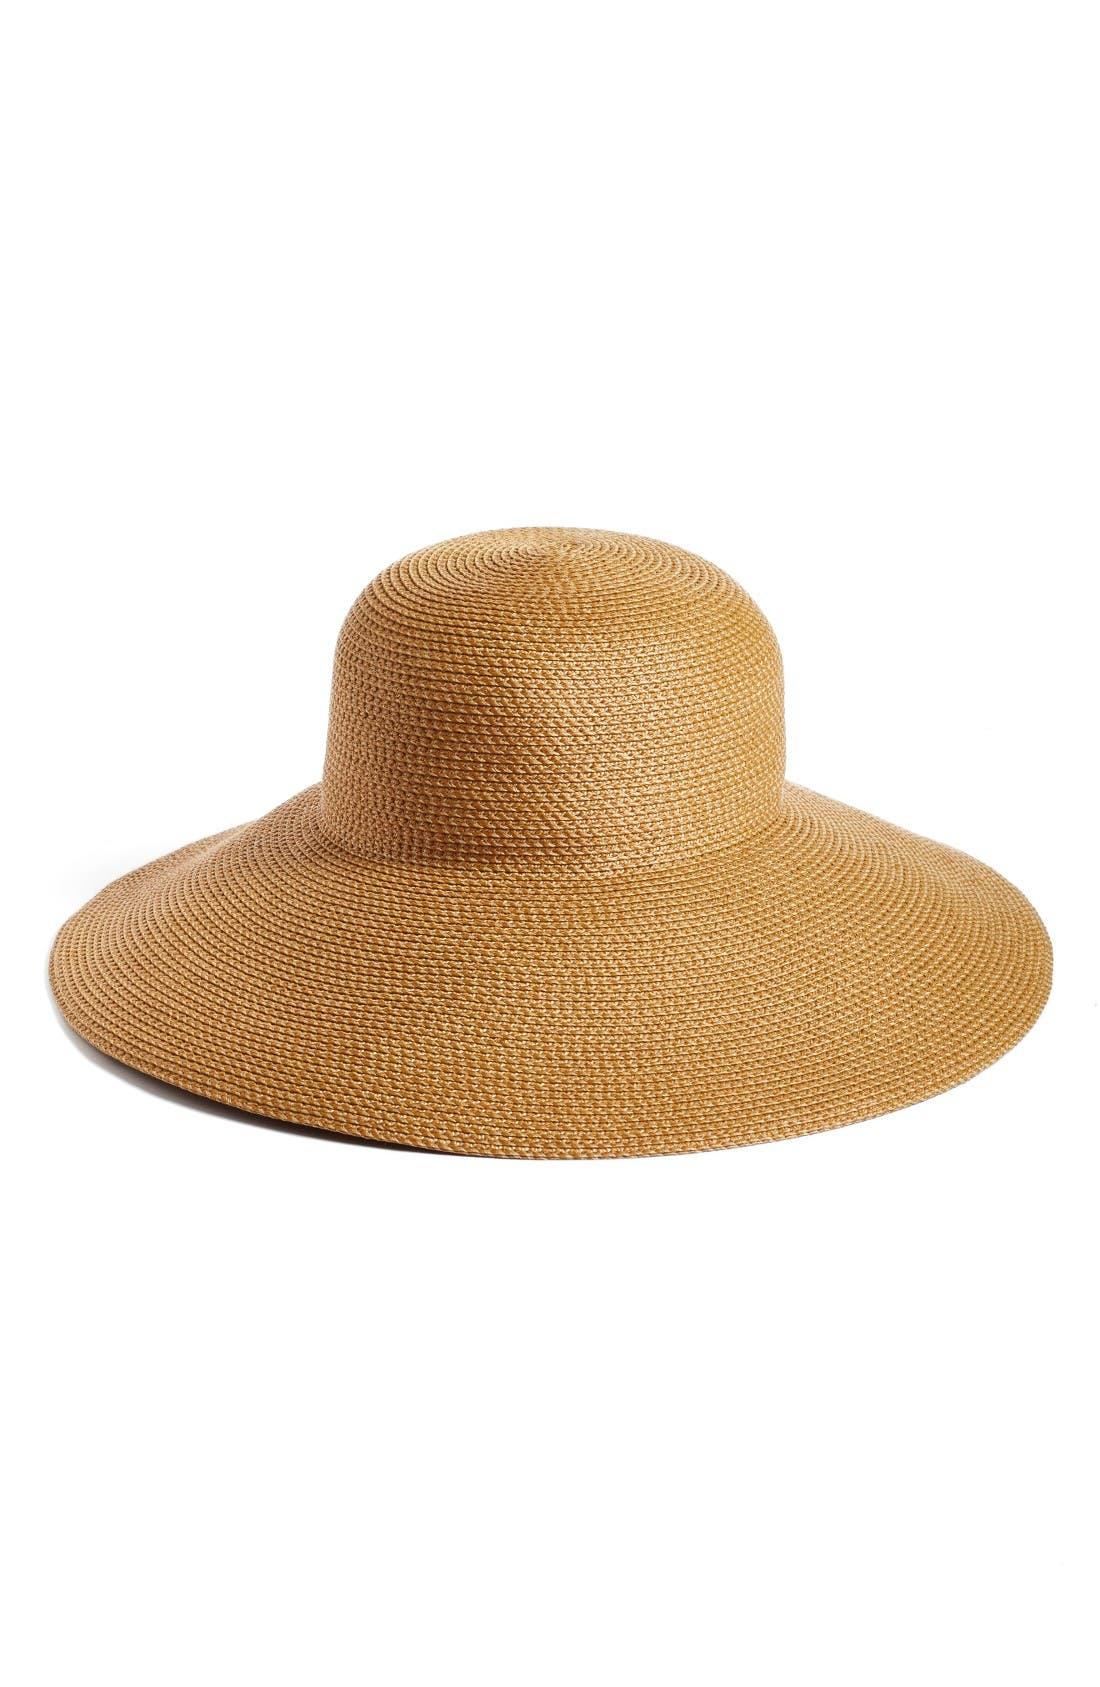 Bella Squishee Sun Hat - Beige in Natural